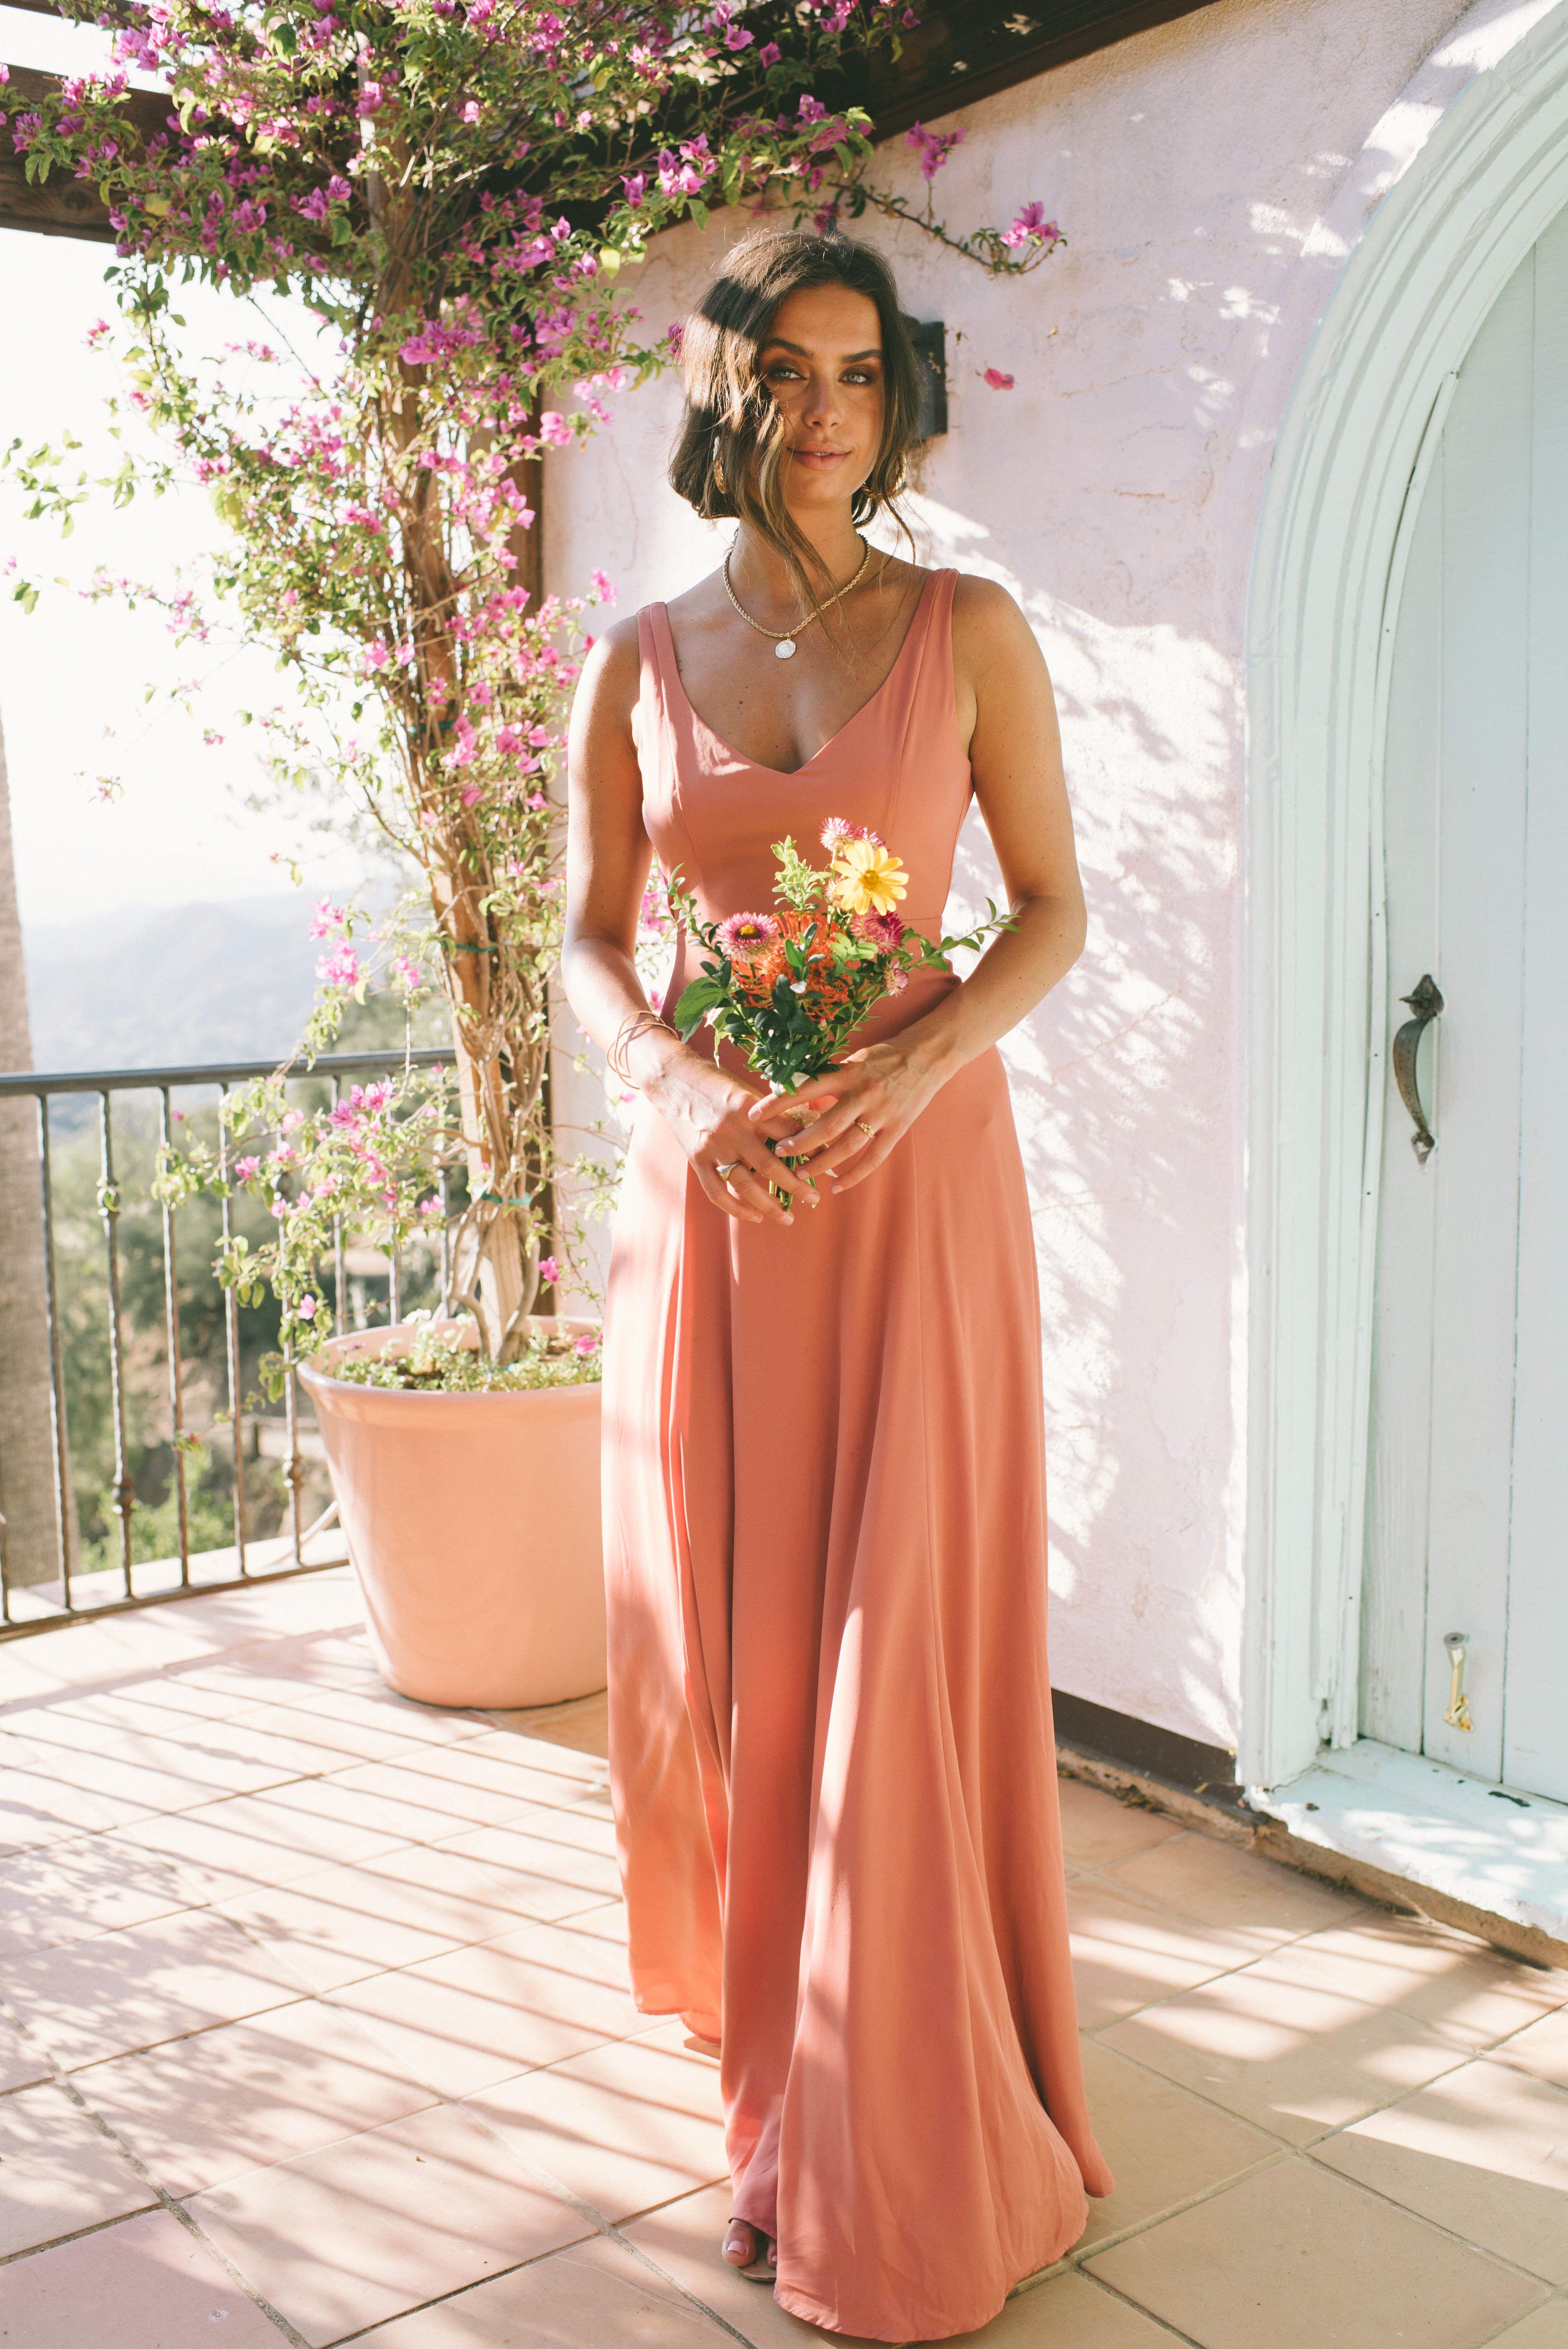 Jenn Maxi Dress Rustic Mauve Crisp Casual wedding